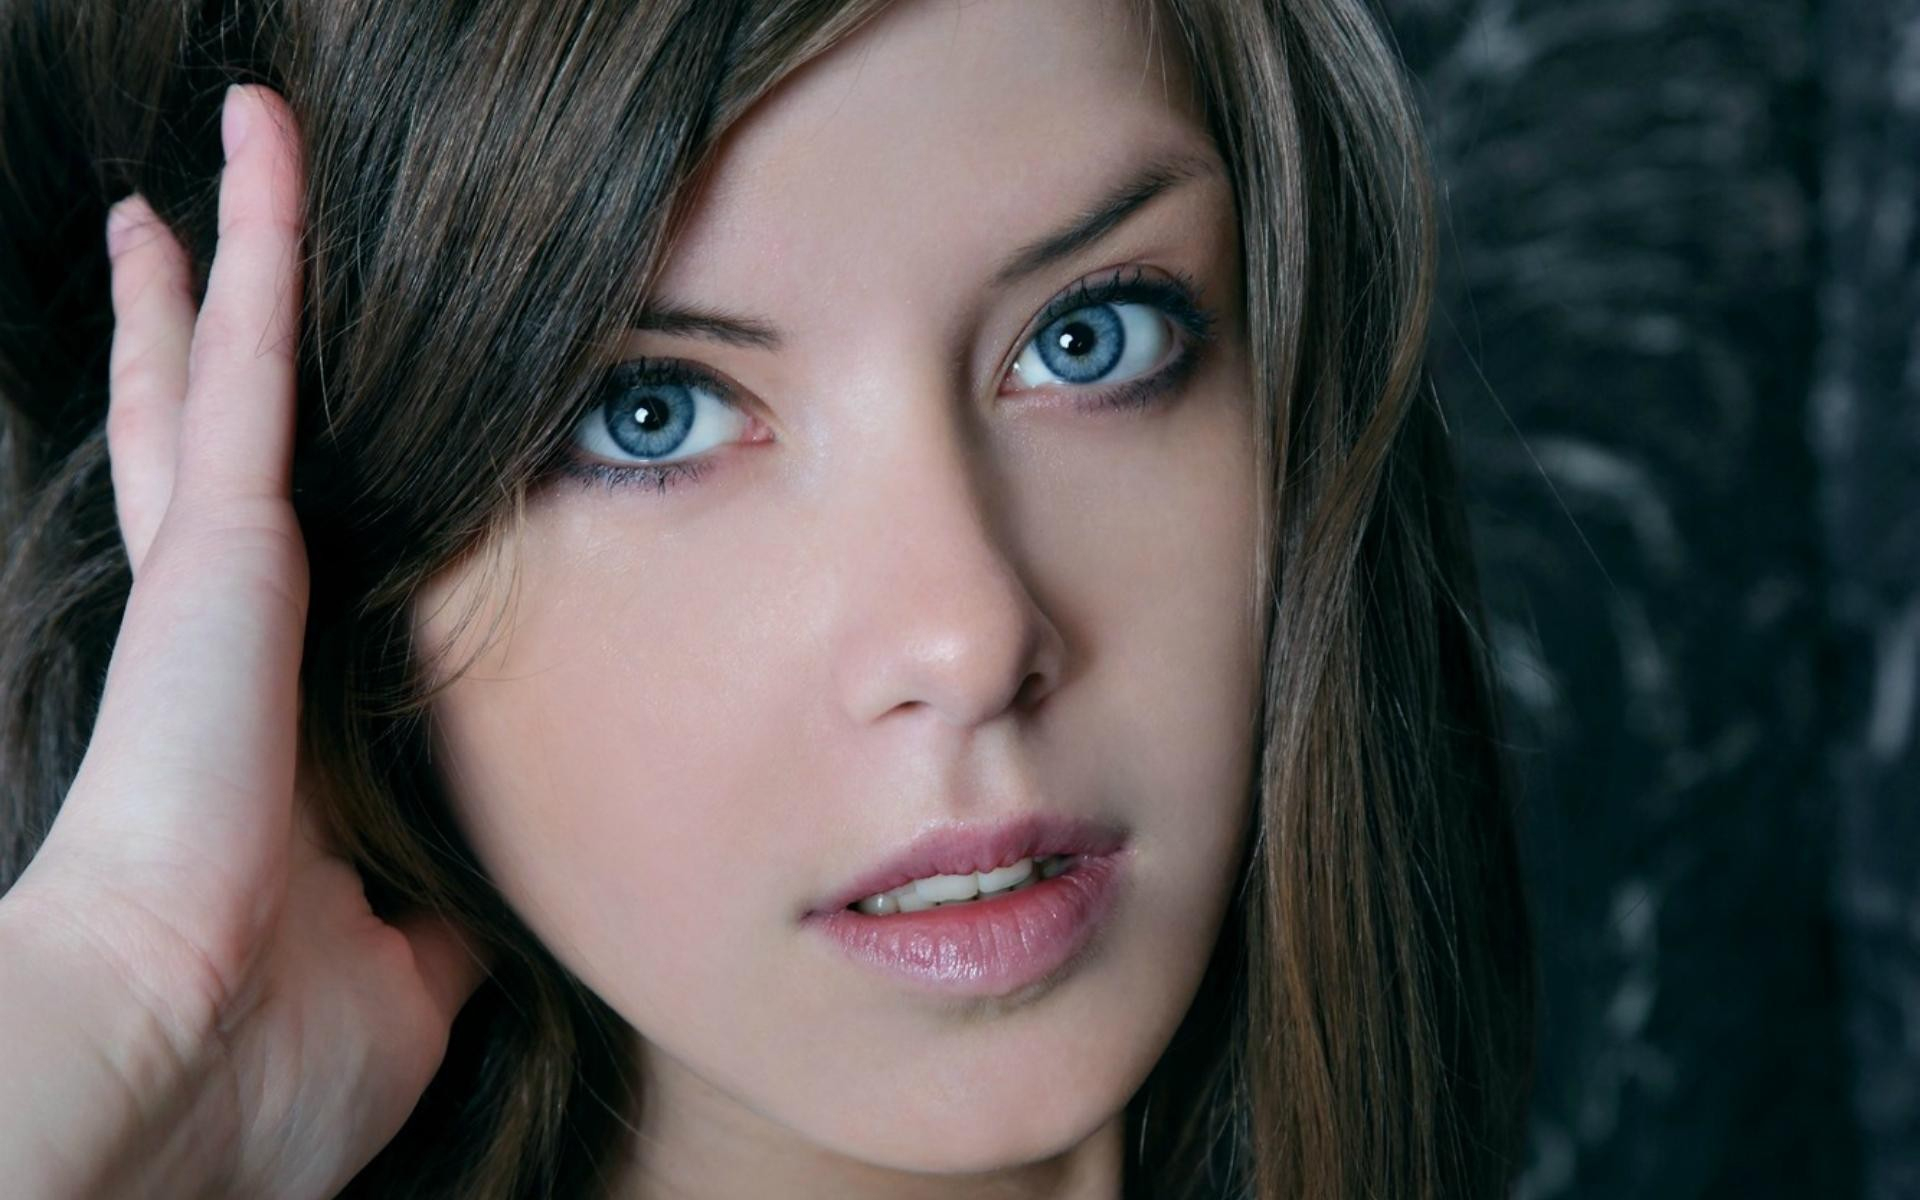 200 az russian girl names beautiful and unique - 1024×600